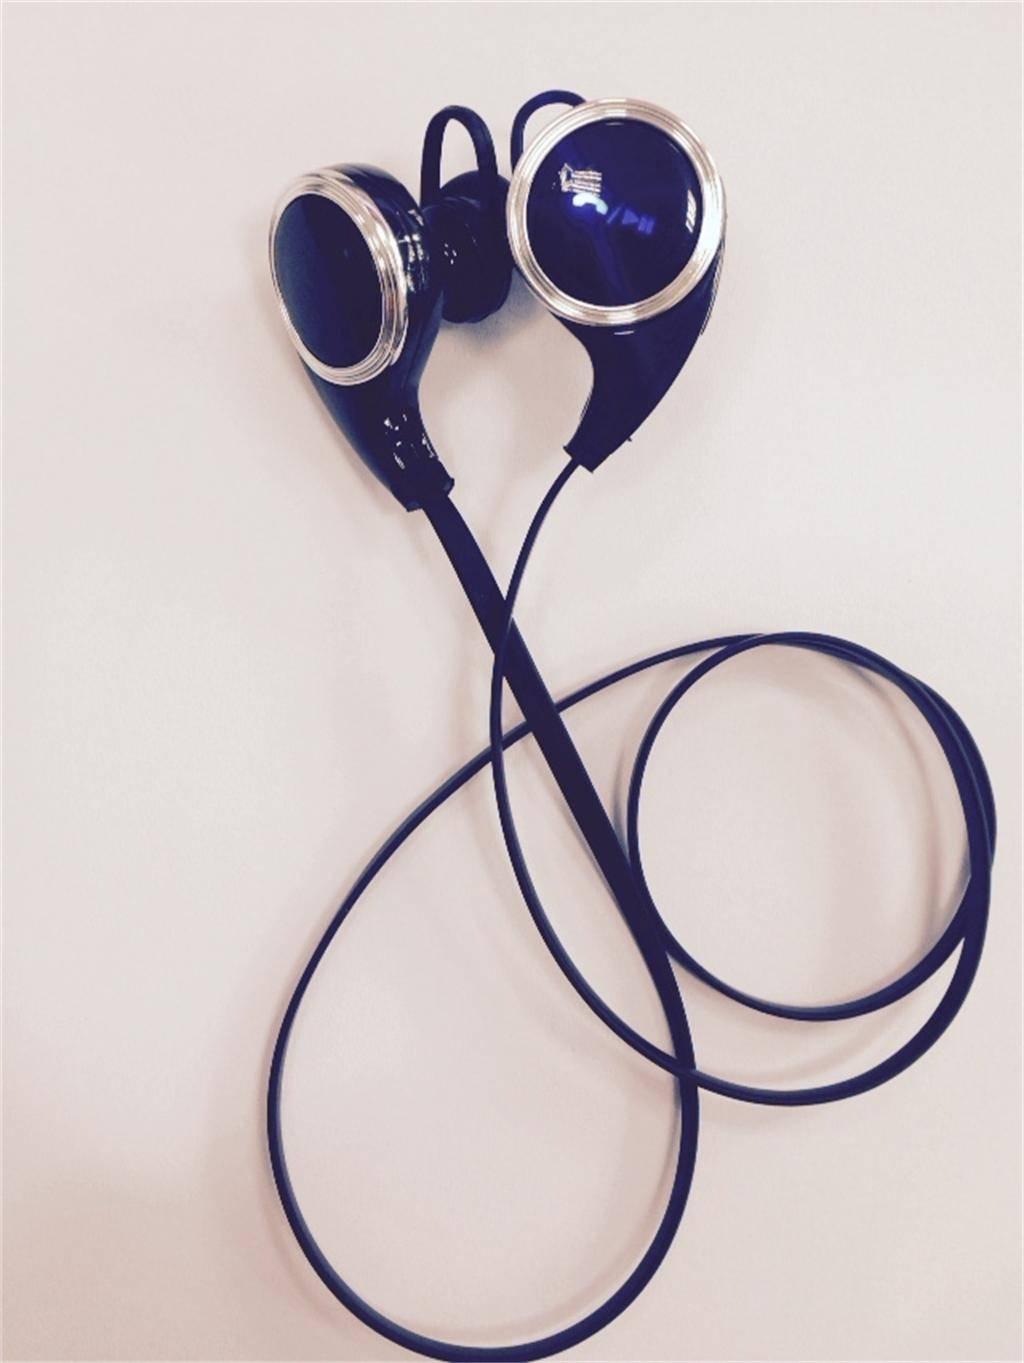 Q8 mini Sport wireless Bluetooth stereo headphone neckband in-ear music earphone handsfree for smar